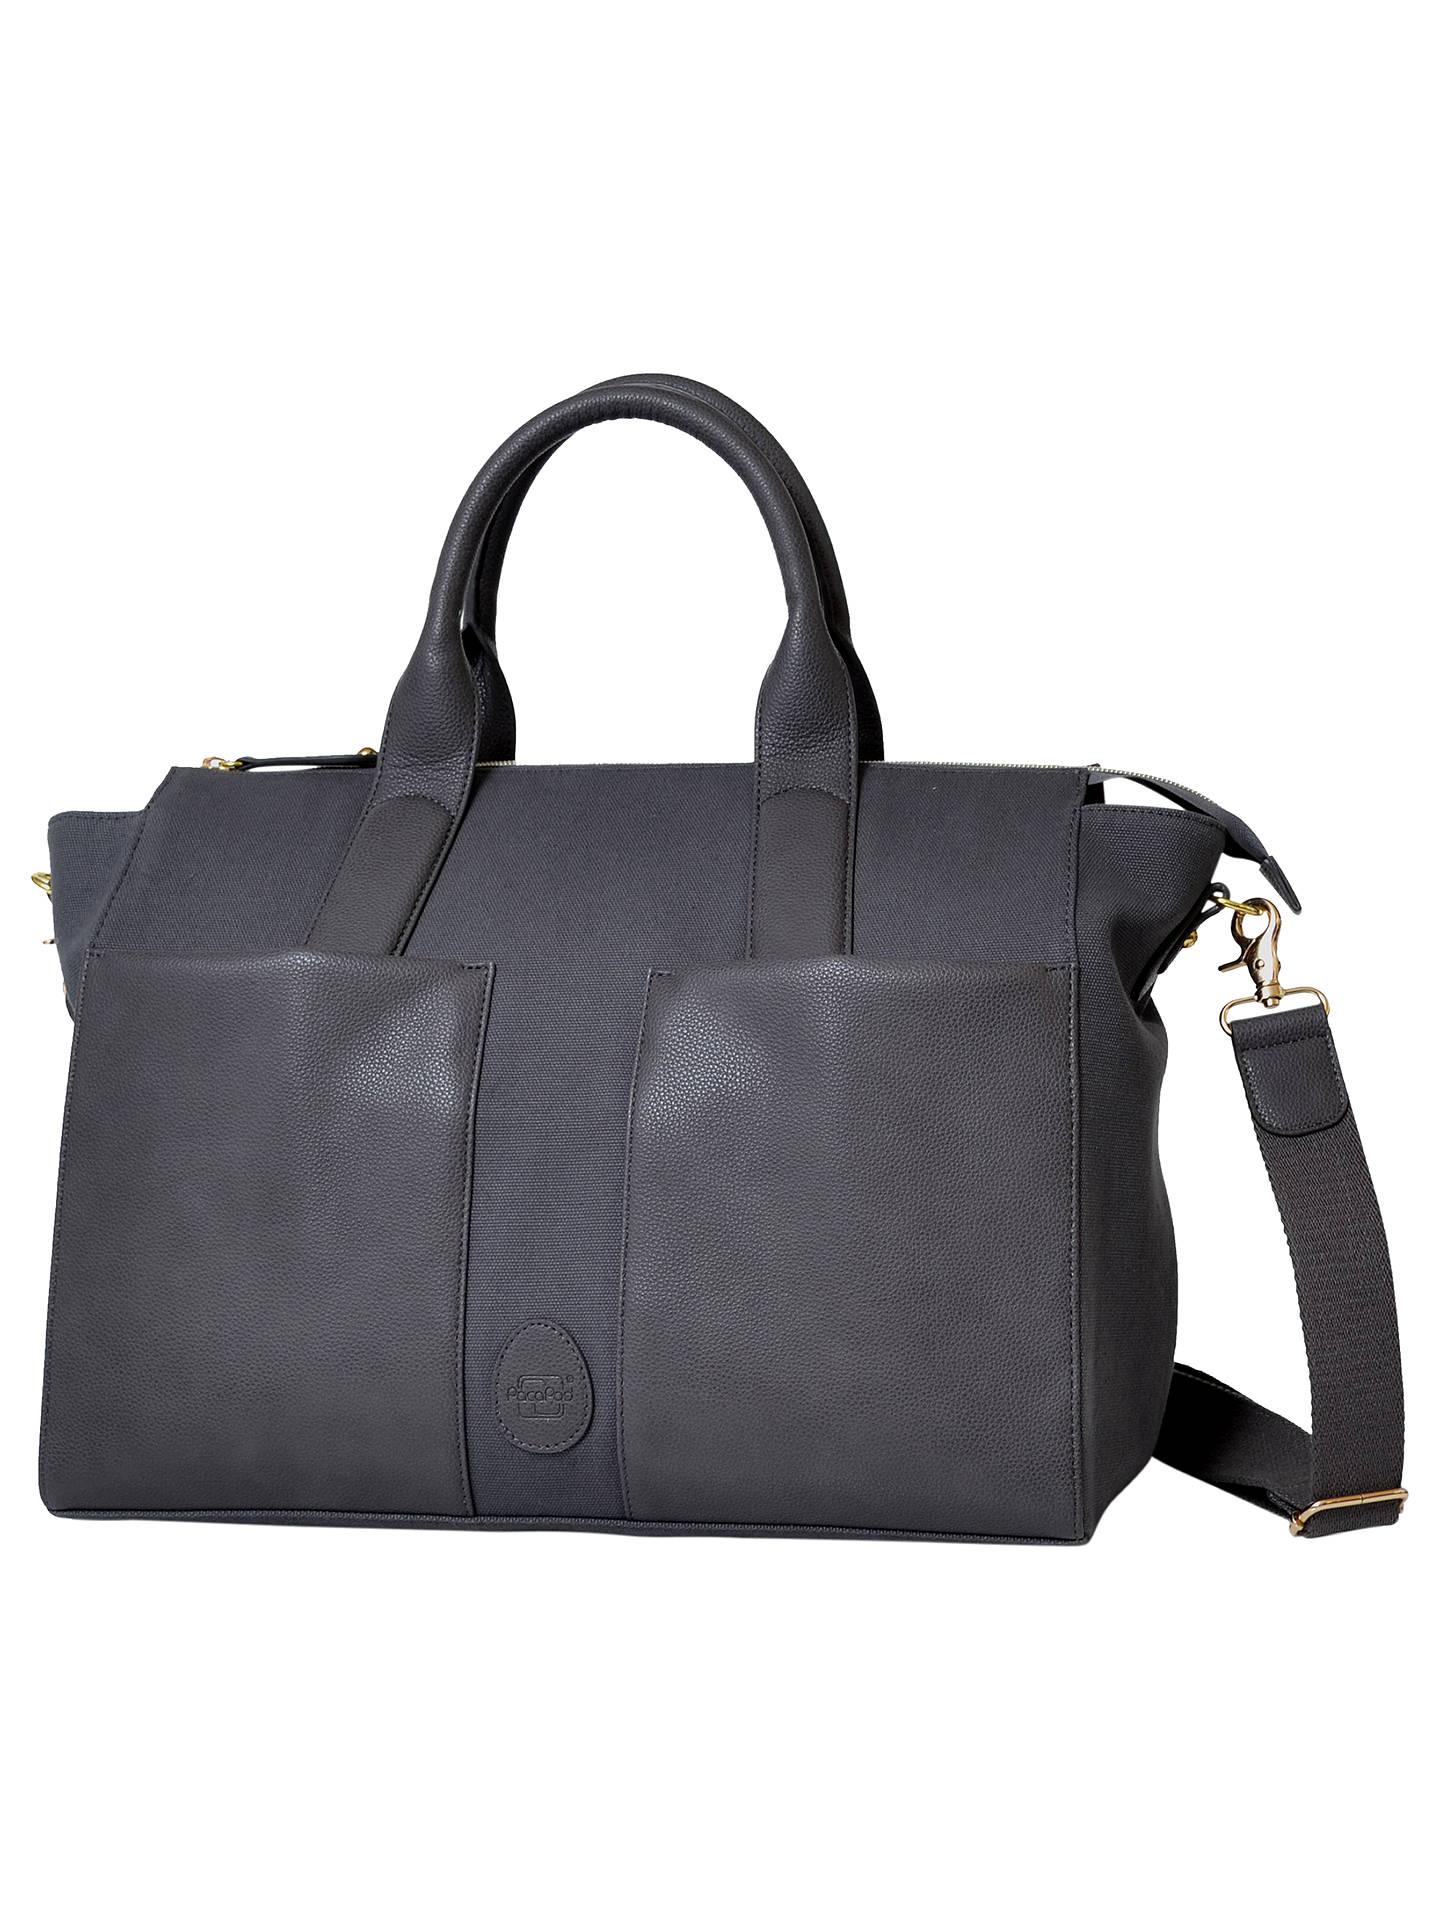 Pacapod Croyde Changing Bag Pewter Online At Johnlewis